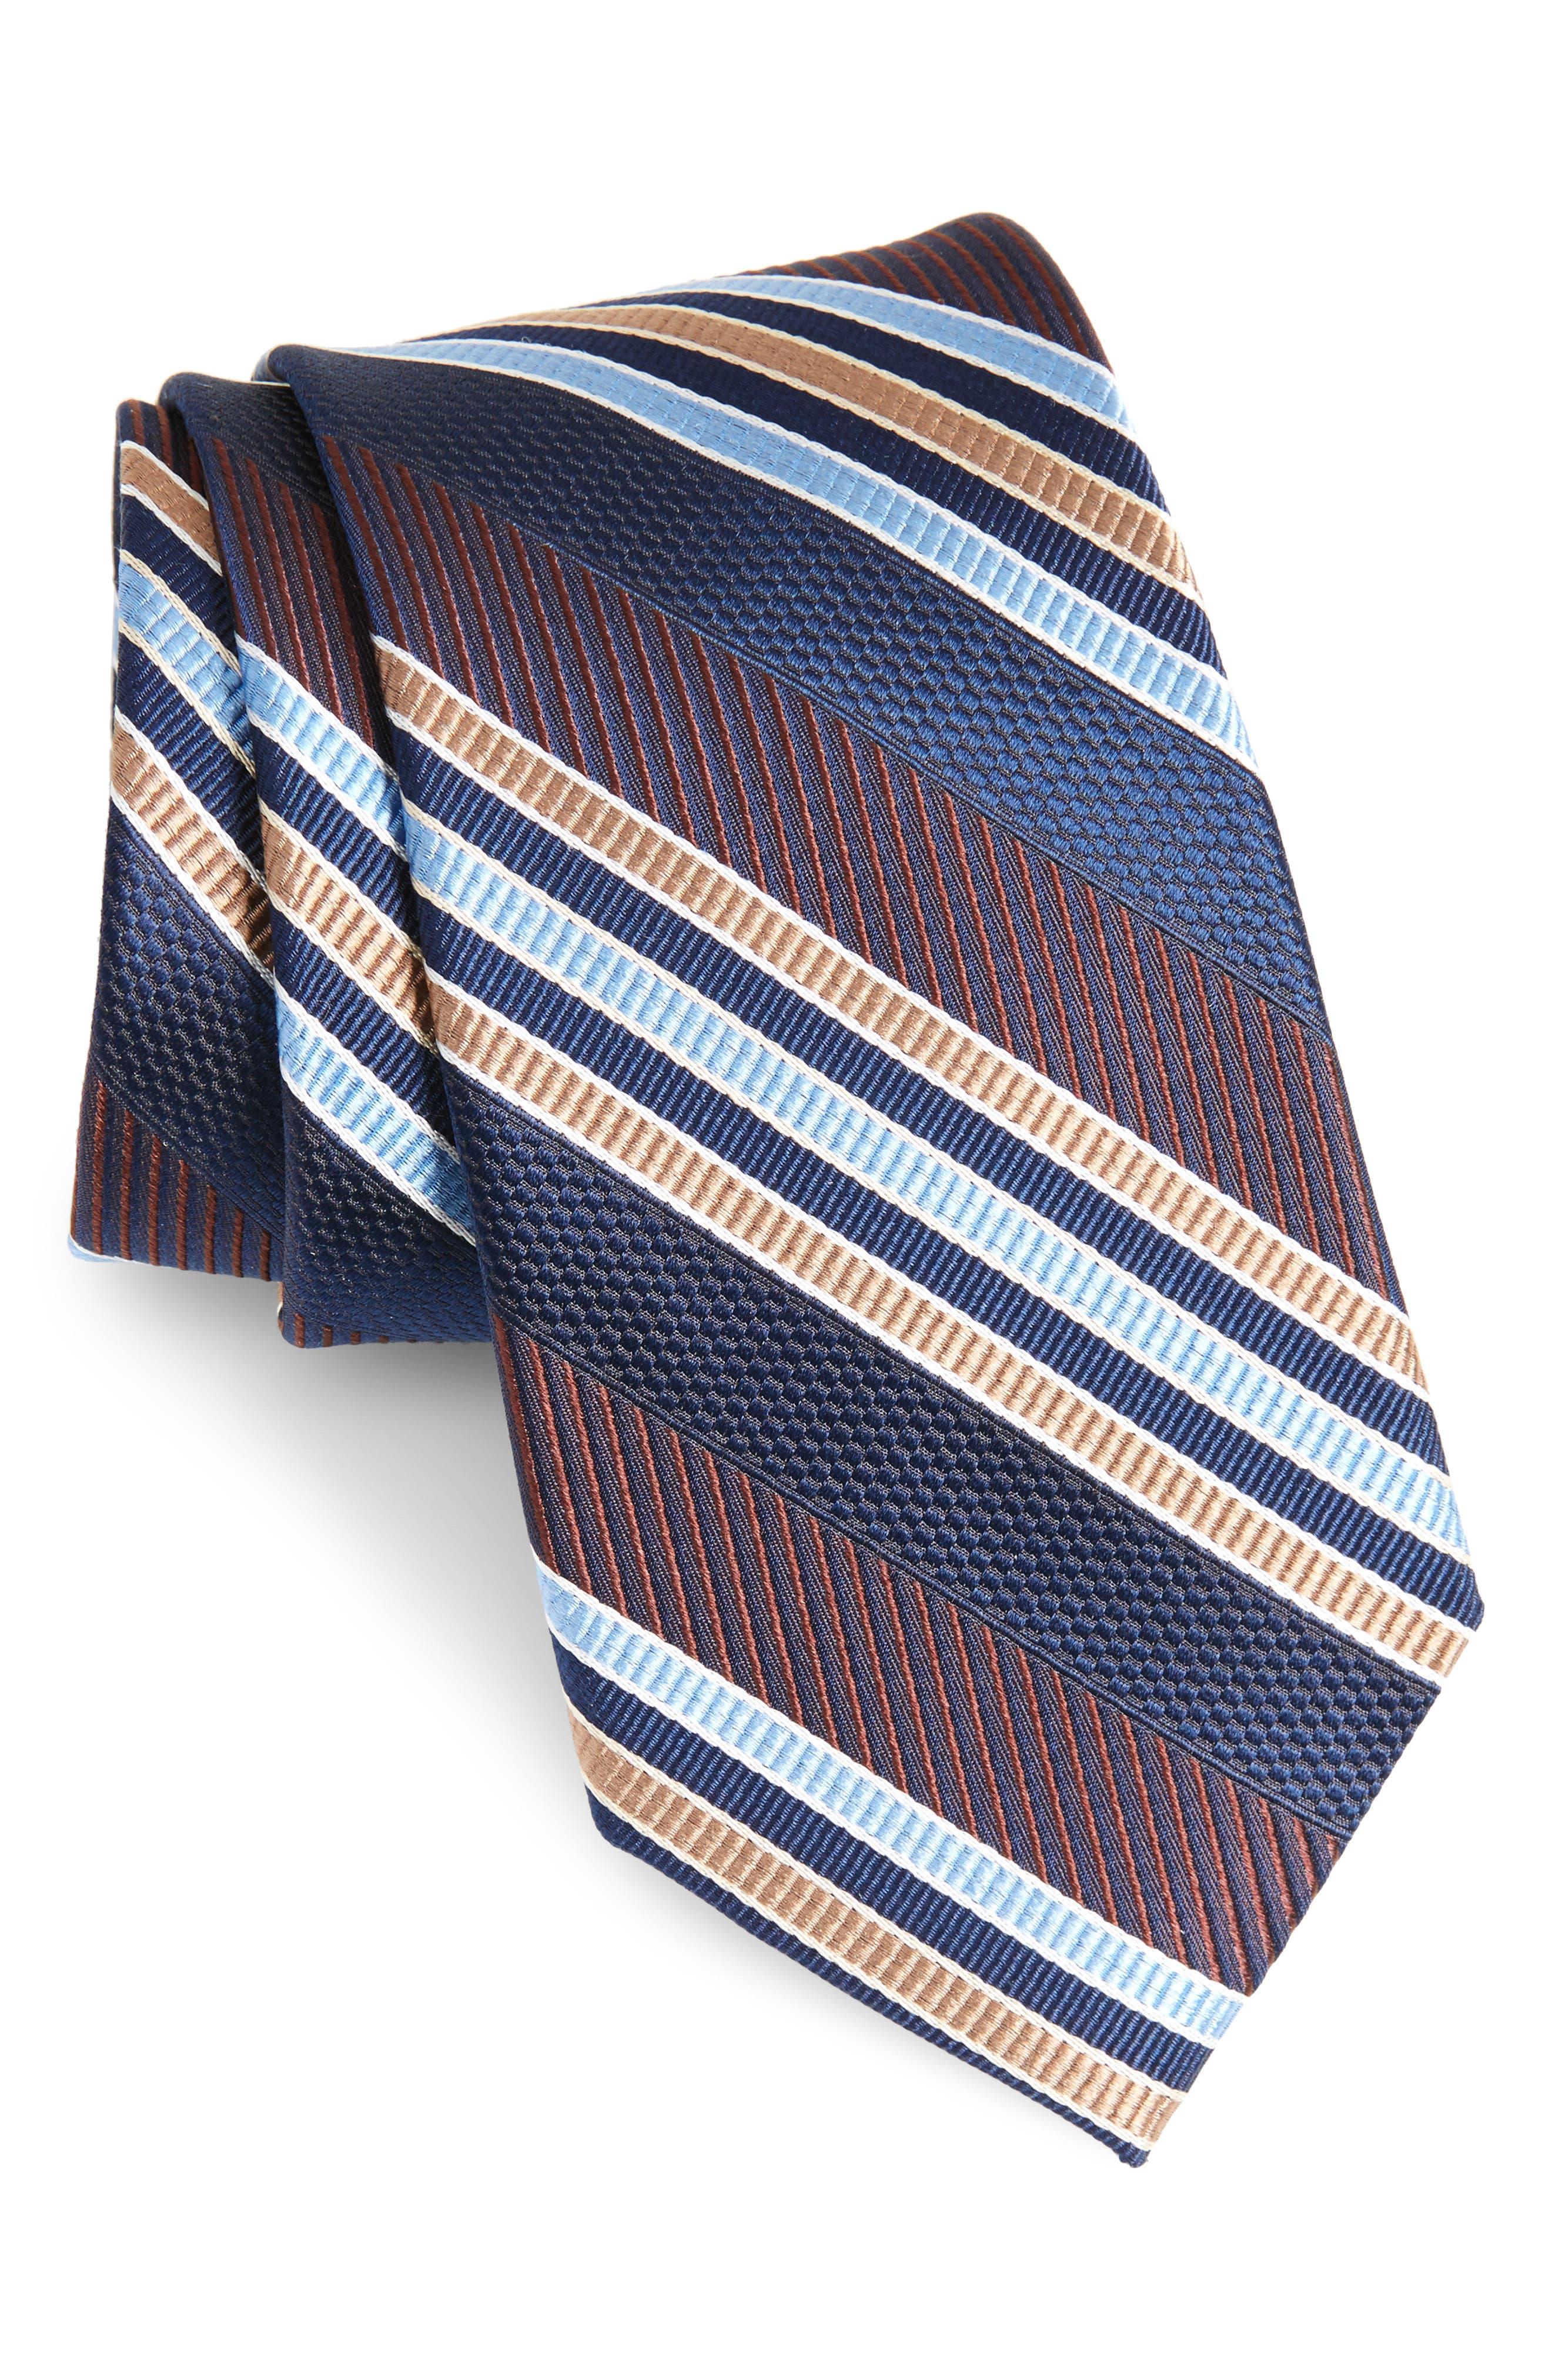 Alternate Image 1 Selected - Nordstrom Men's Shop Northwest Stripe Silk Tie